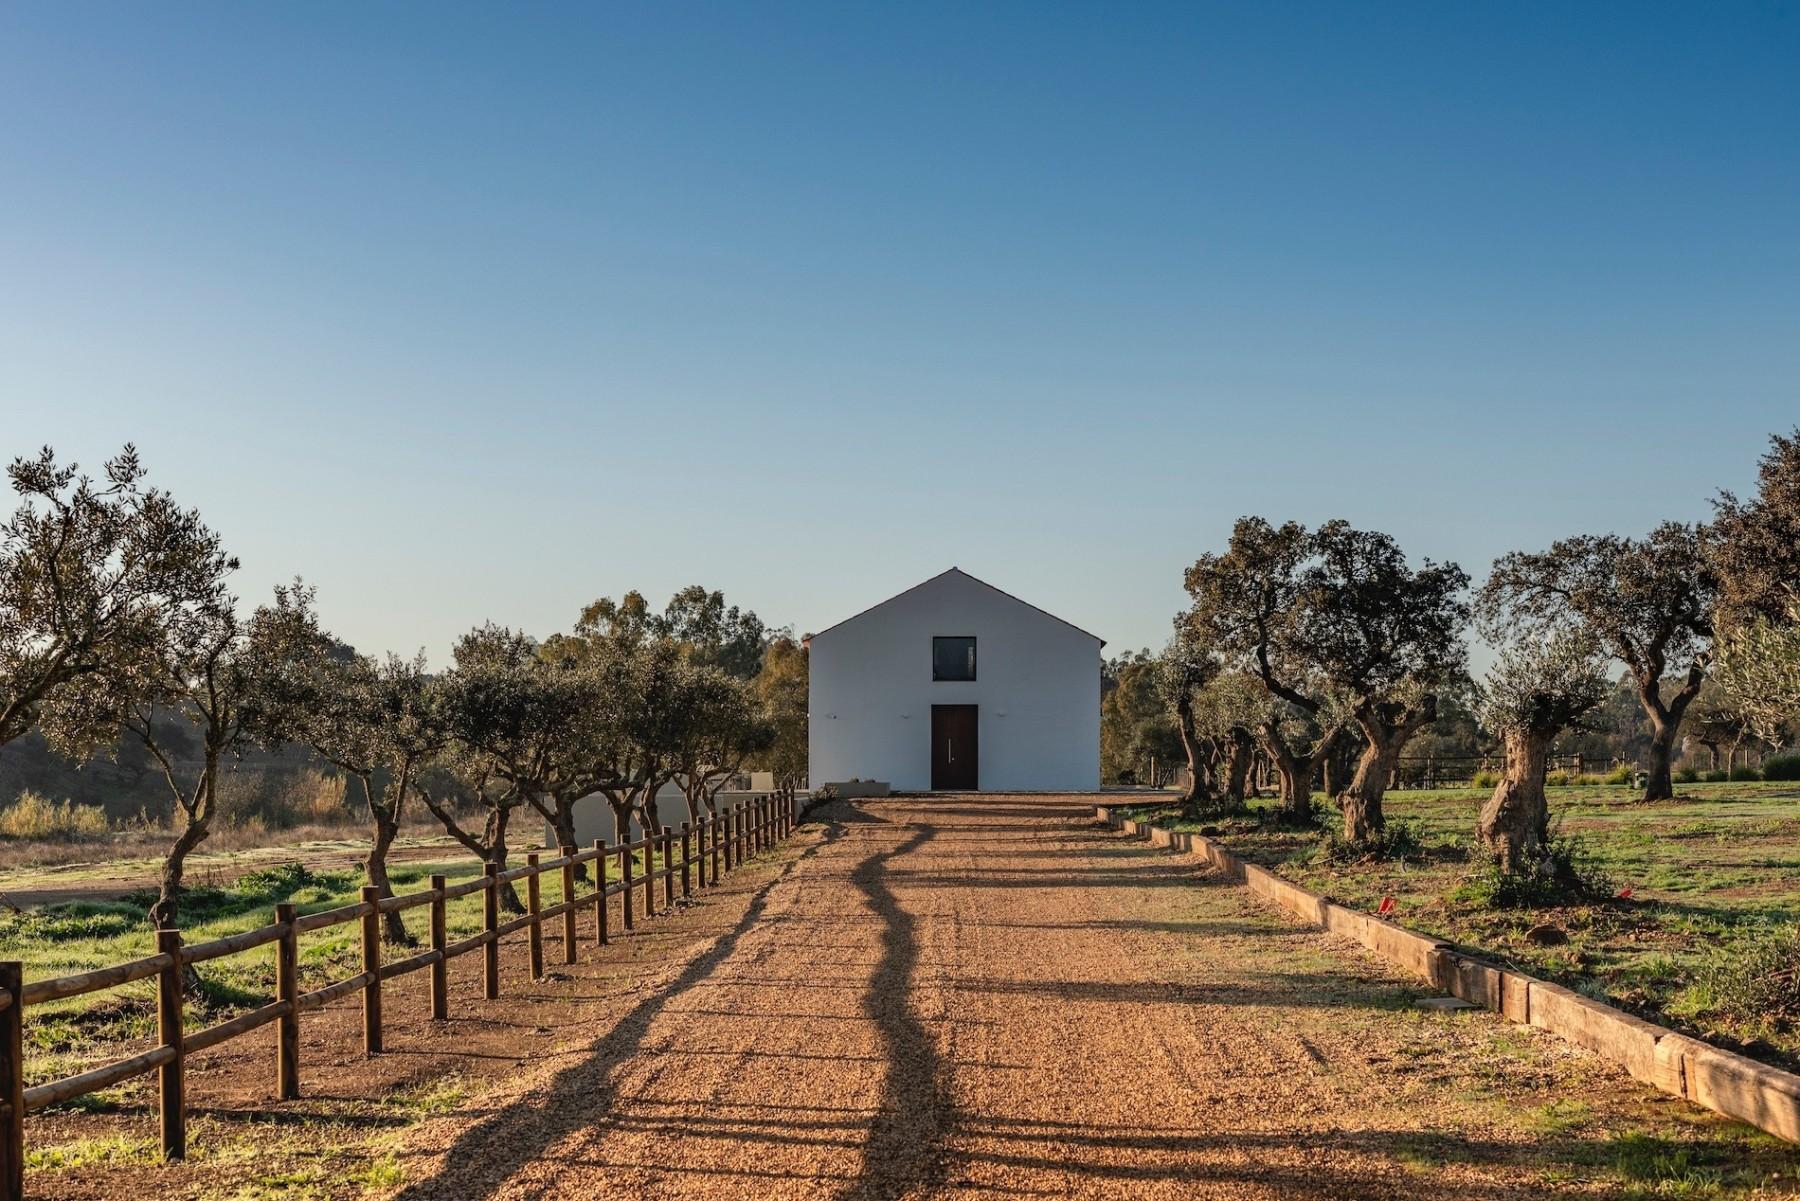 https://tours.winetourismportugal.com/alentejo-luxury-tour-6-days